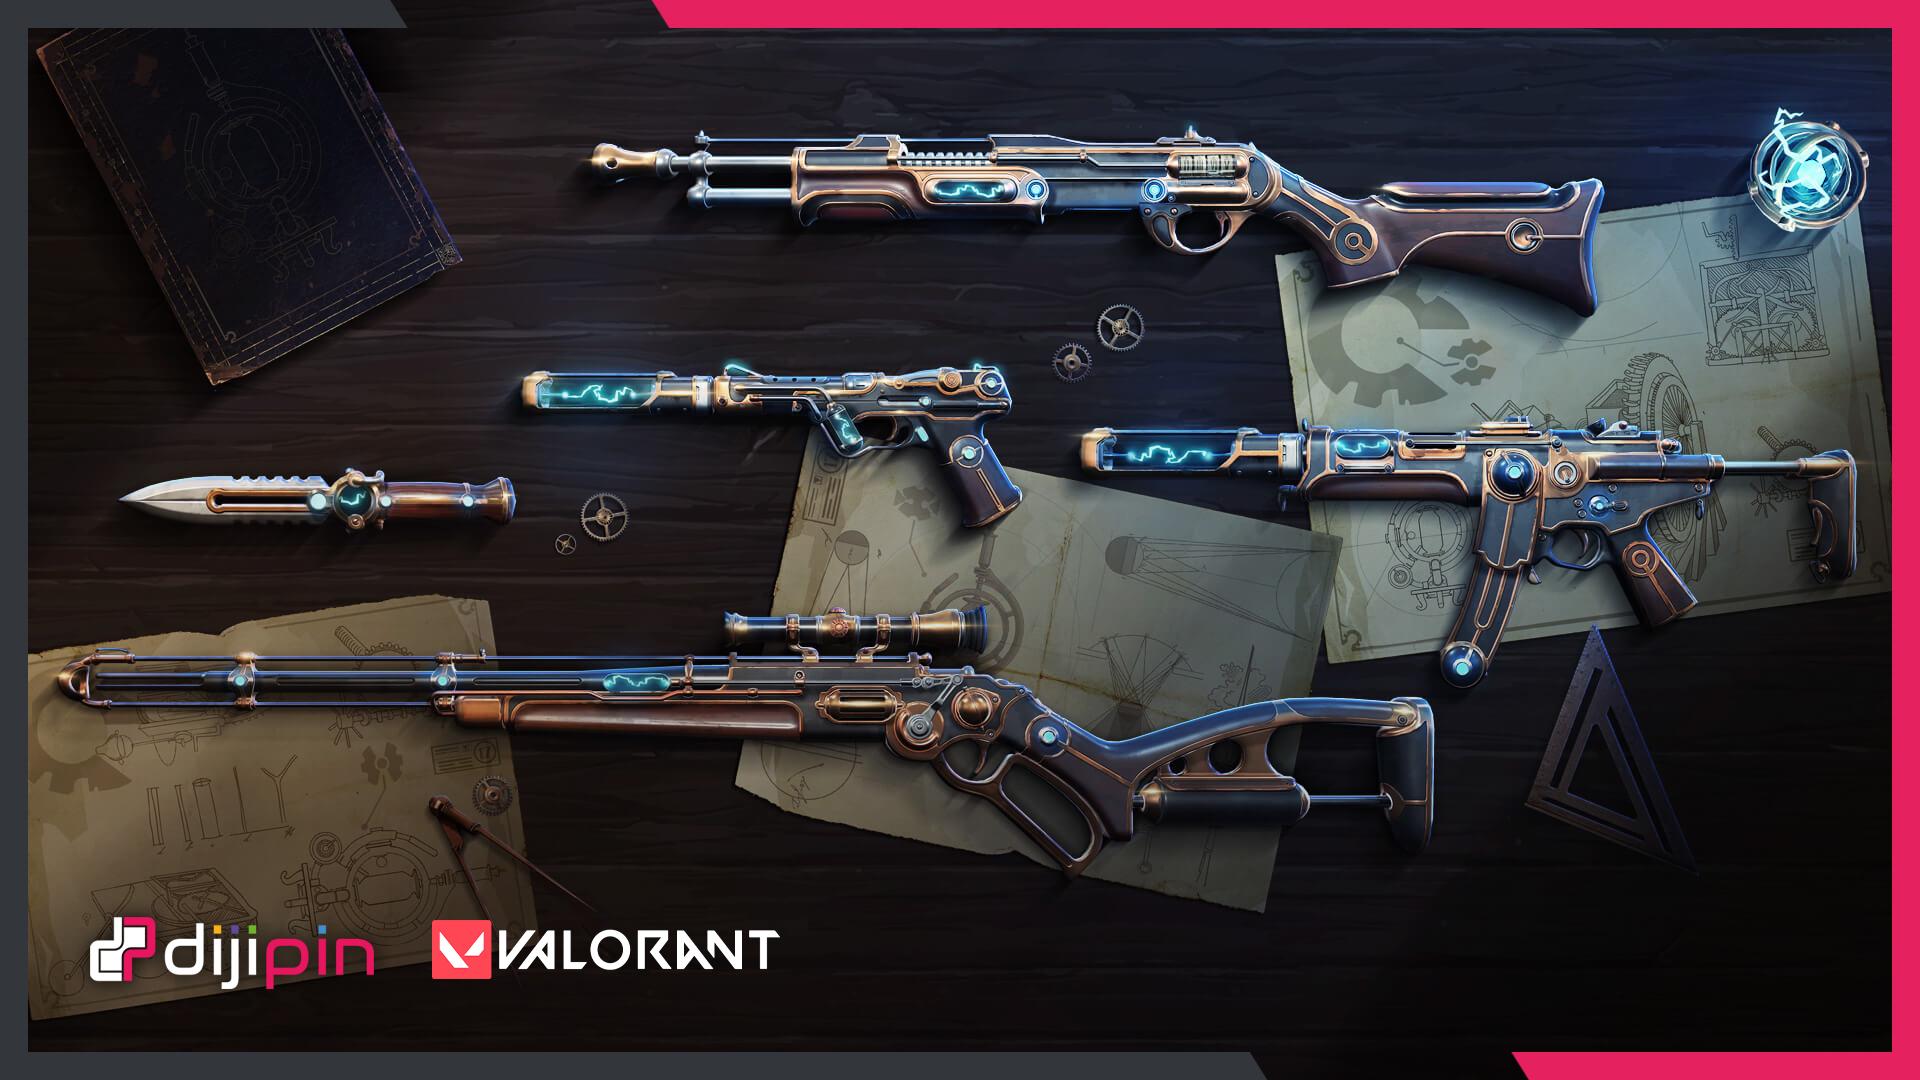 Valorant Yeni Silah Kostüm Paketi Sızdı!